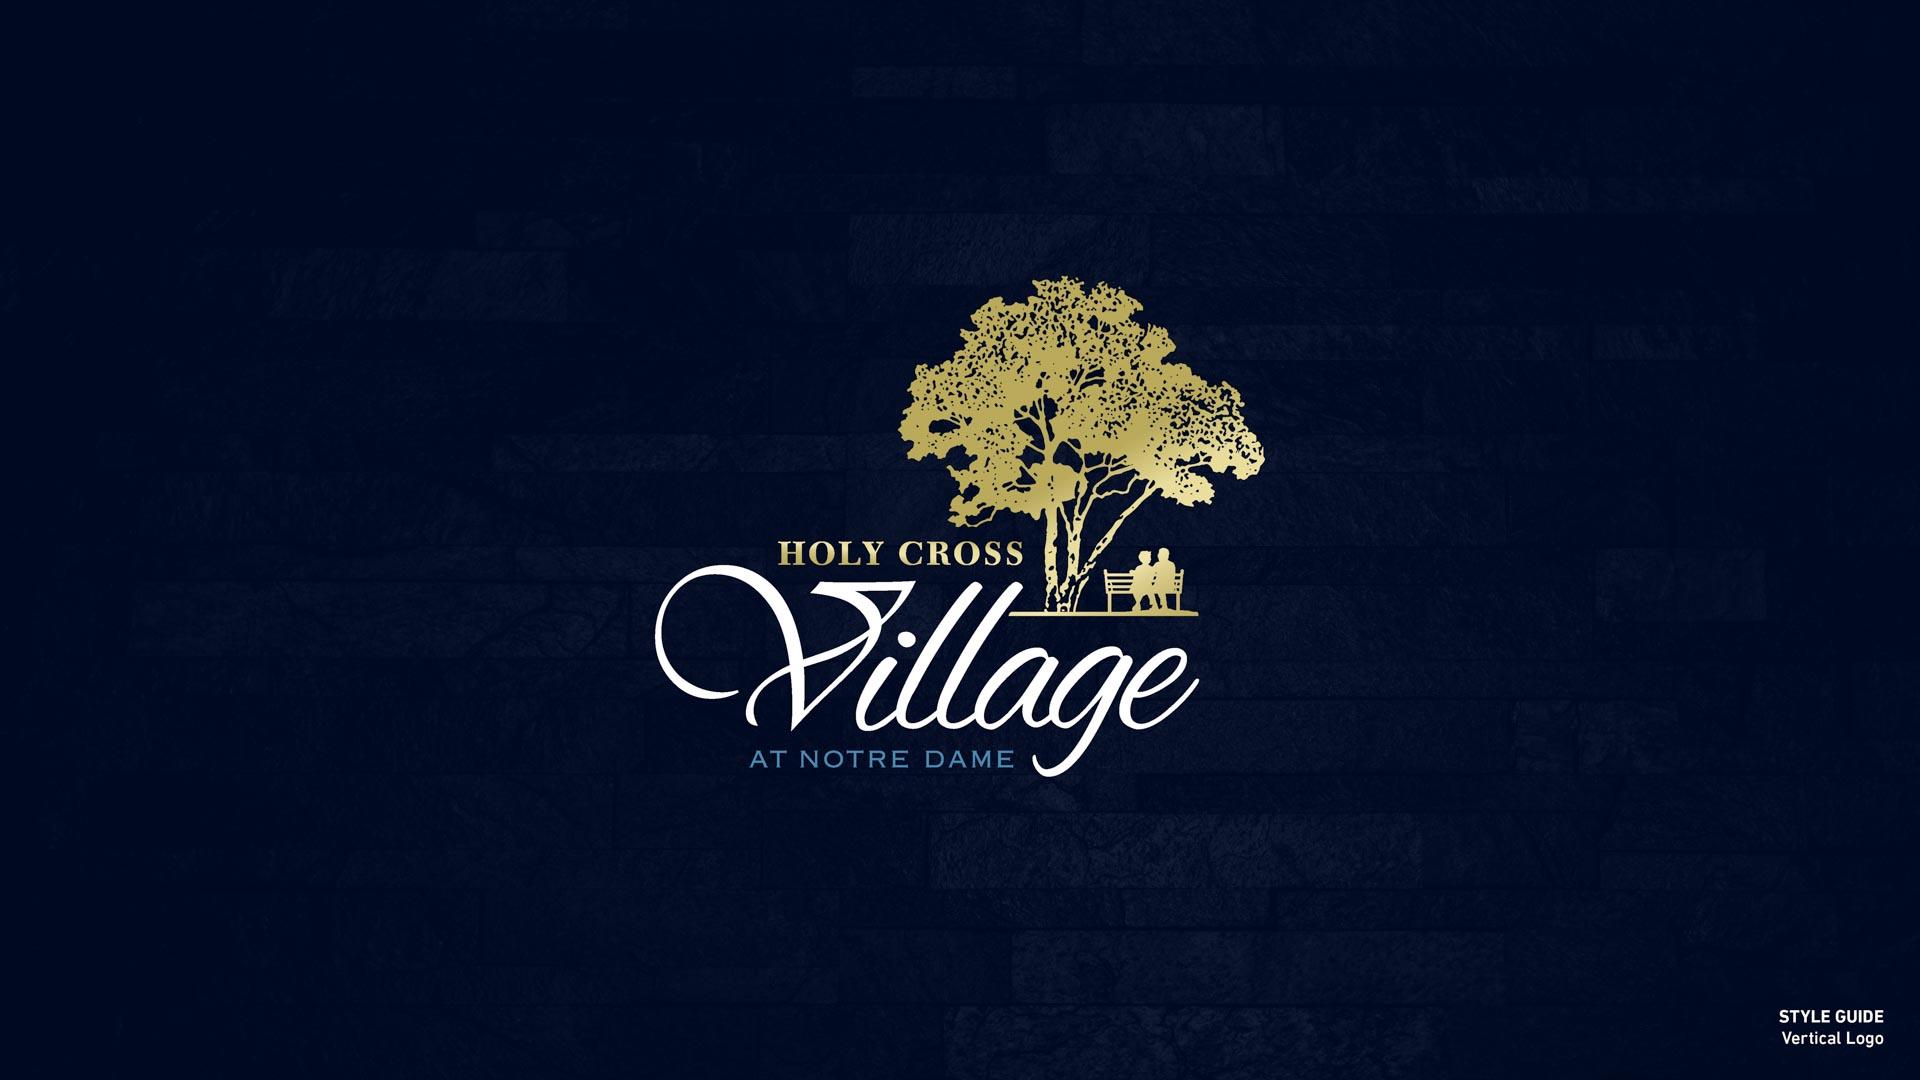 Holy Cross Village's Vertical Logo